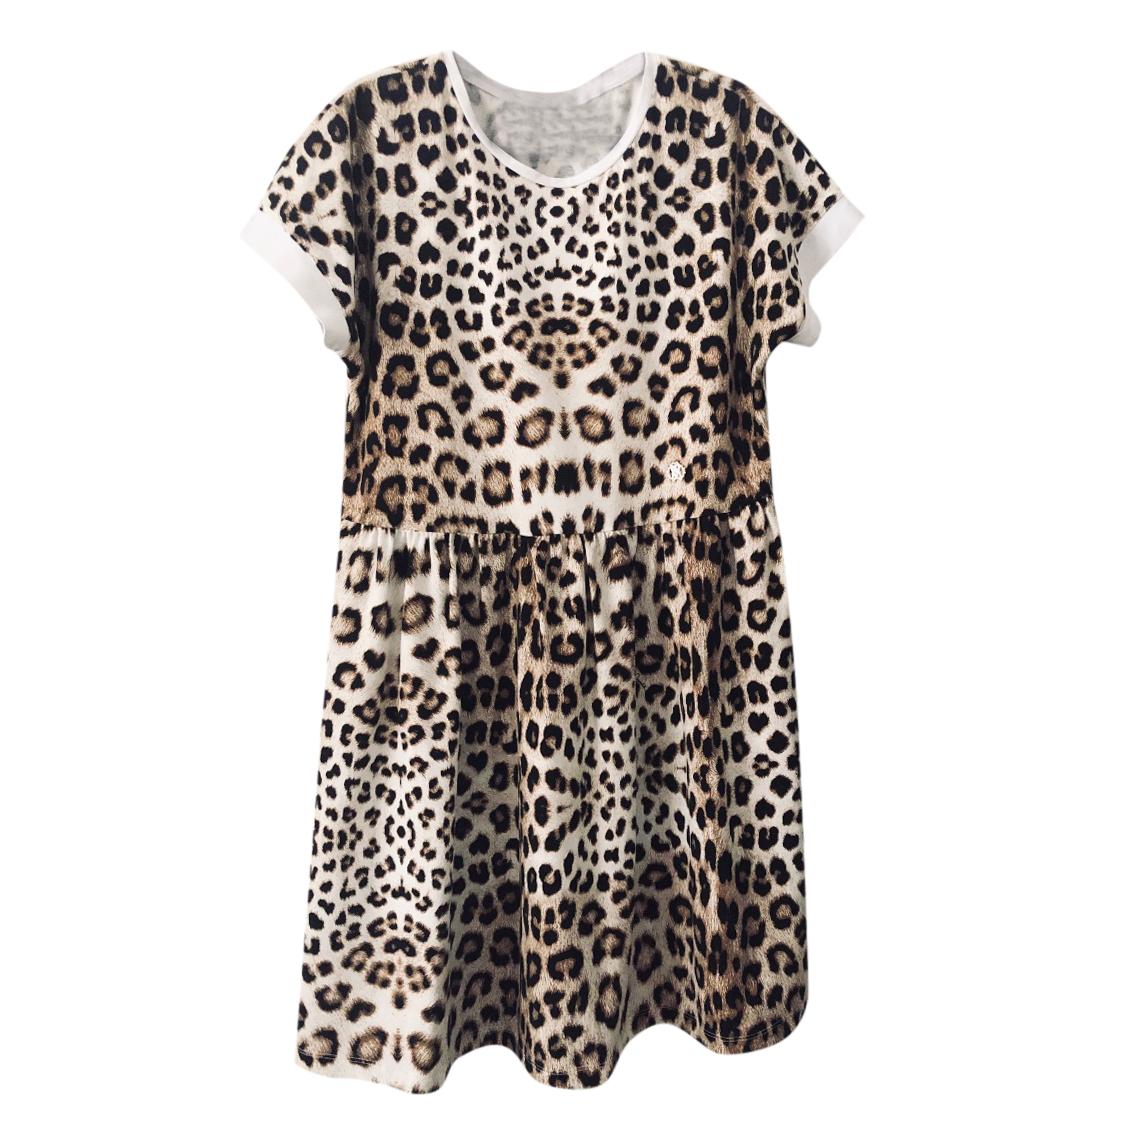 ROBERTO CAVALLI leopard print dress 12 years